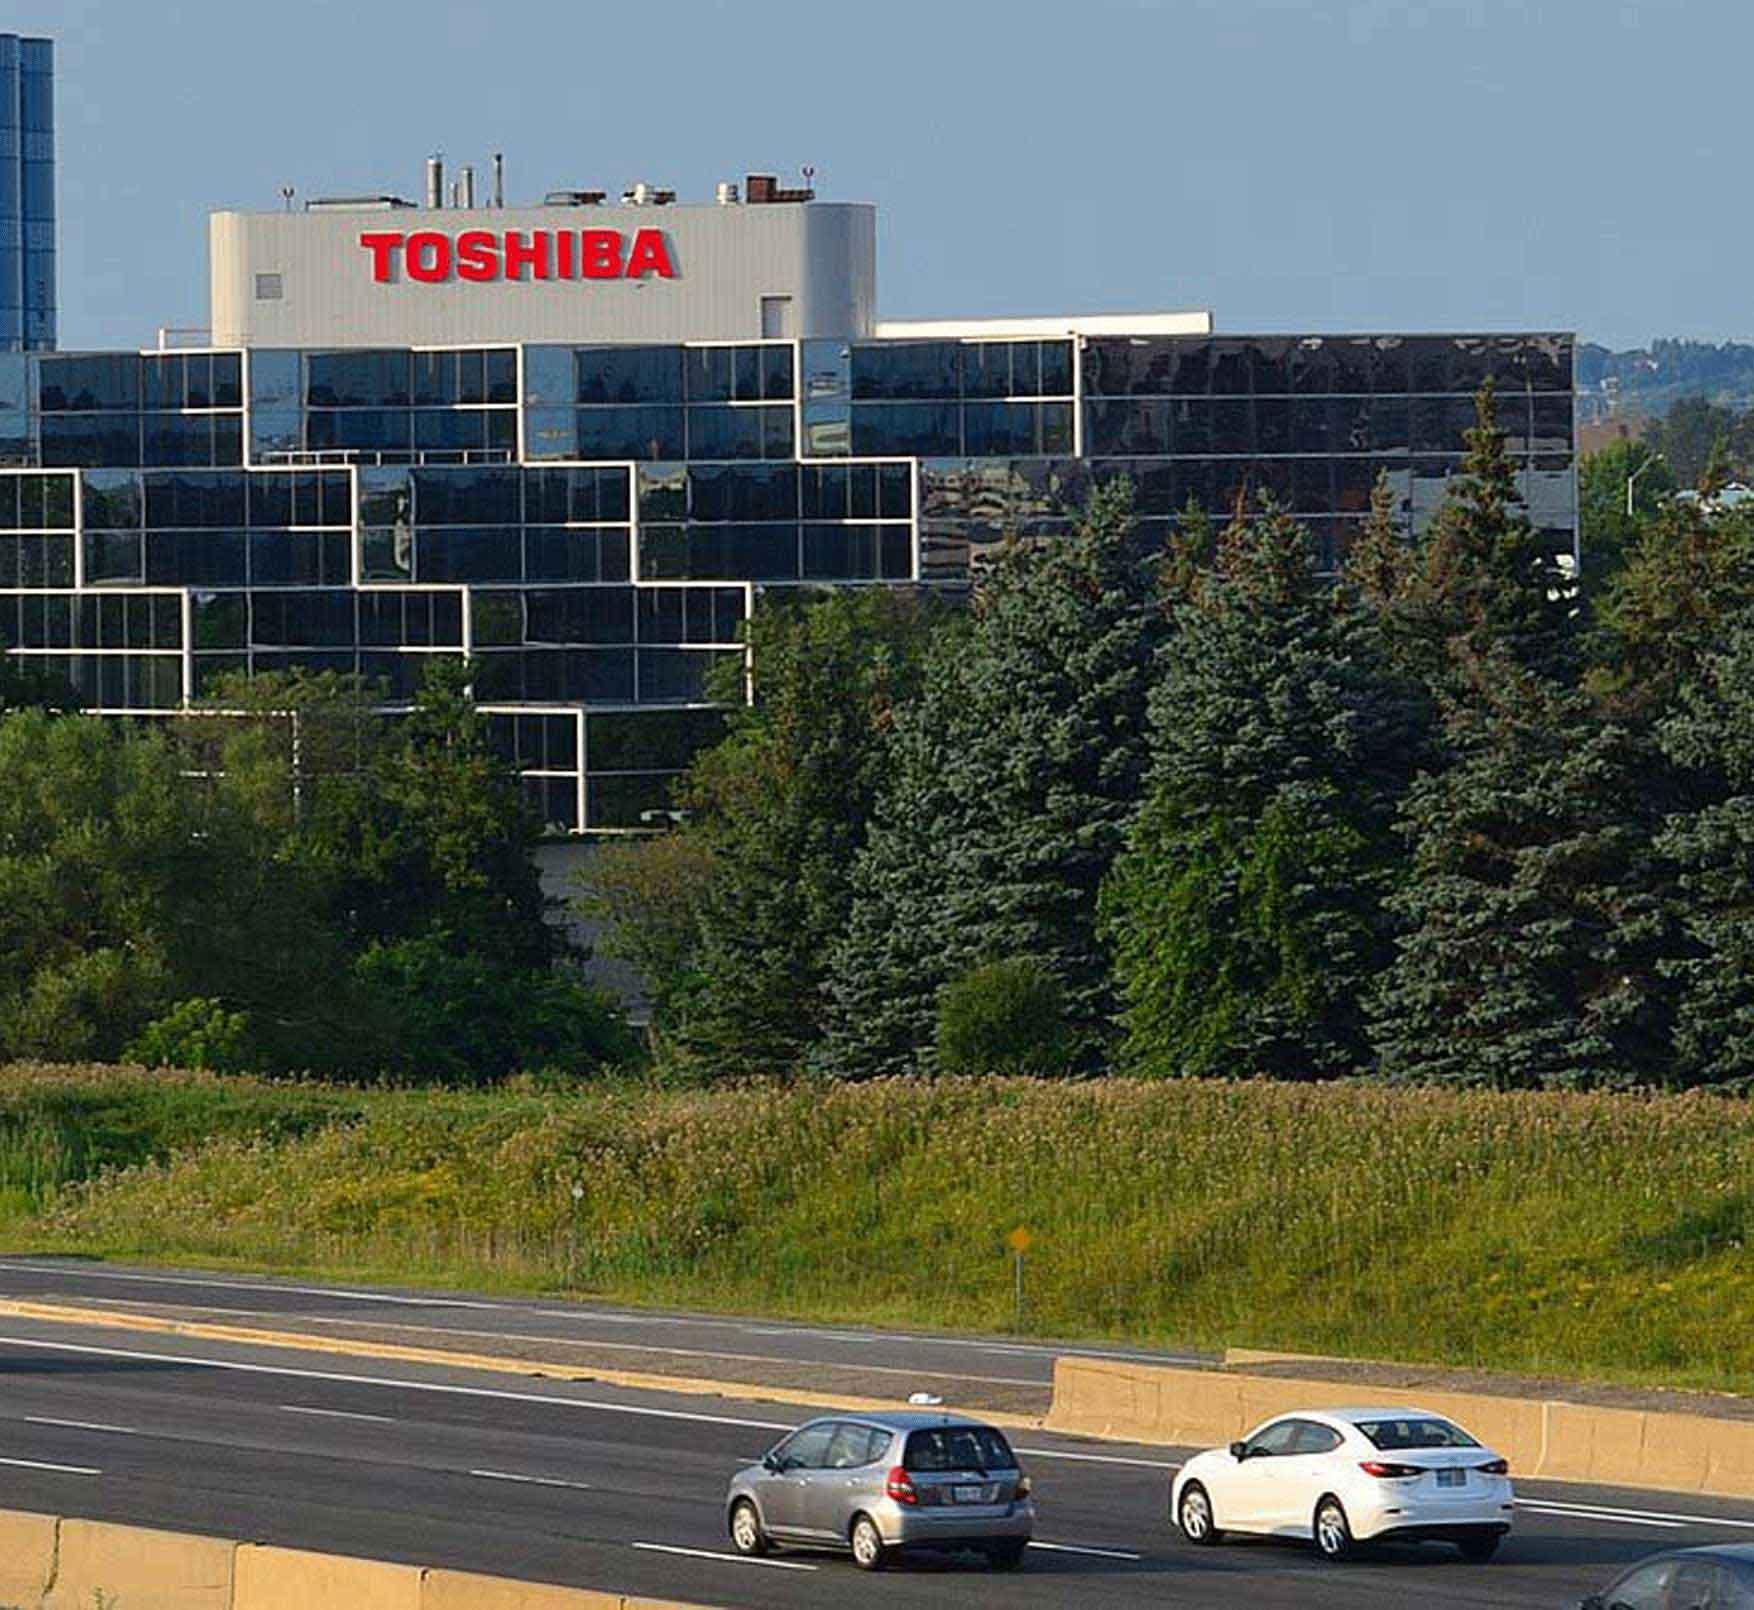 TOSHIBA CANADA WINDOWS 8.1 DRIVER